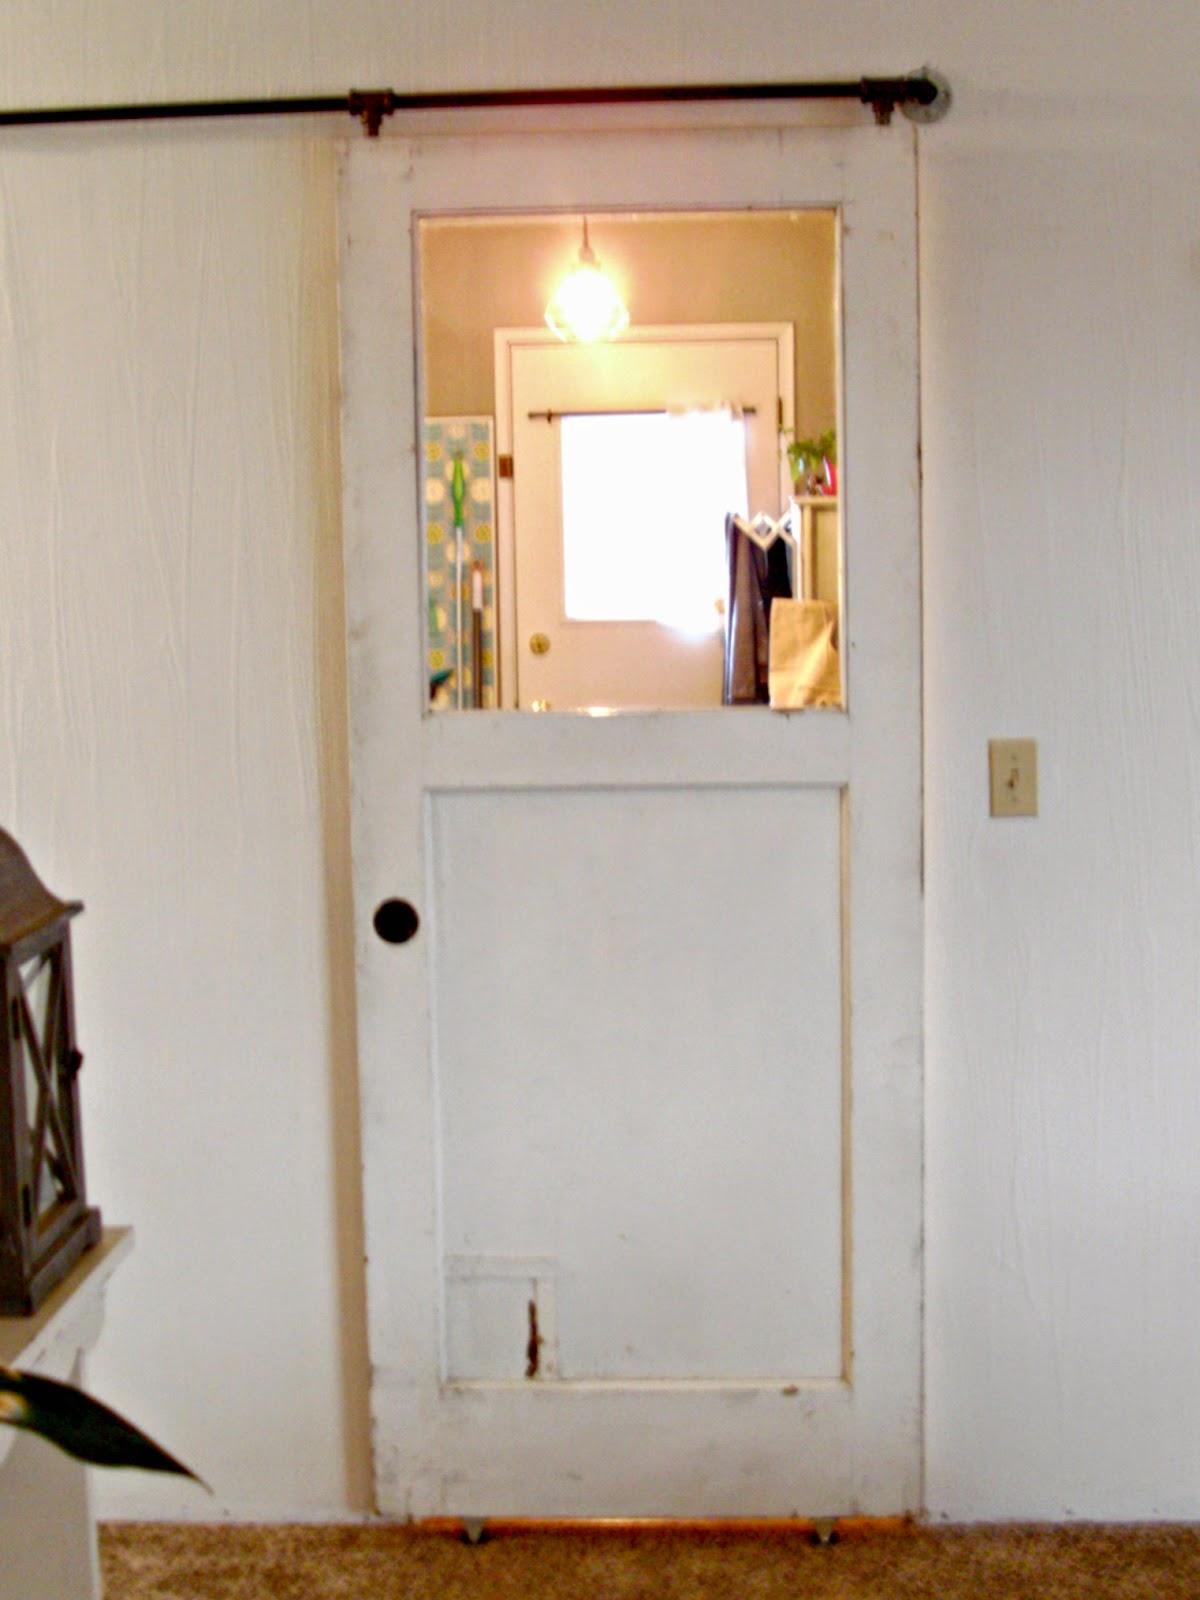 Laundry room redo diy sliding rustic door little for Sliding laundry door